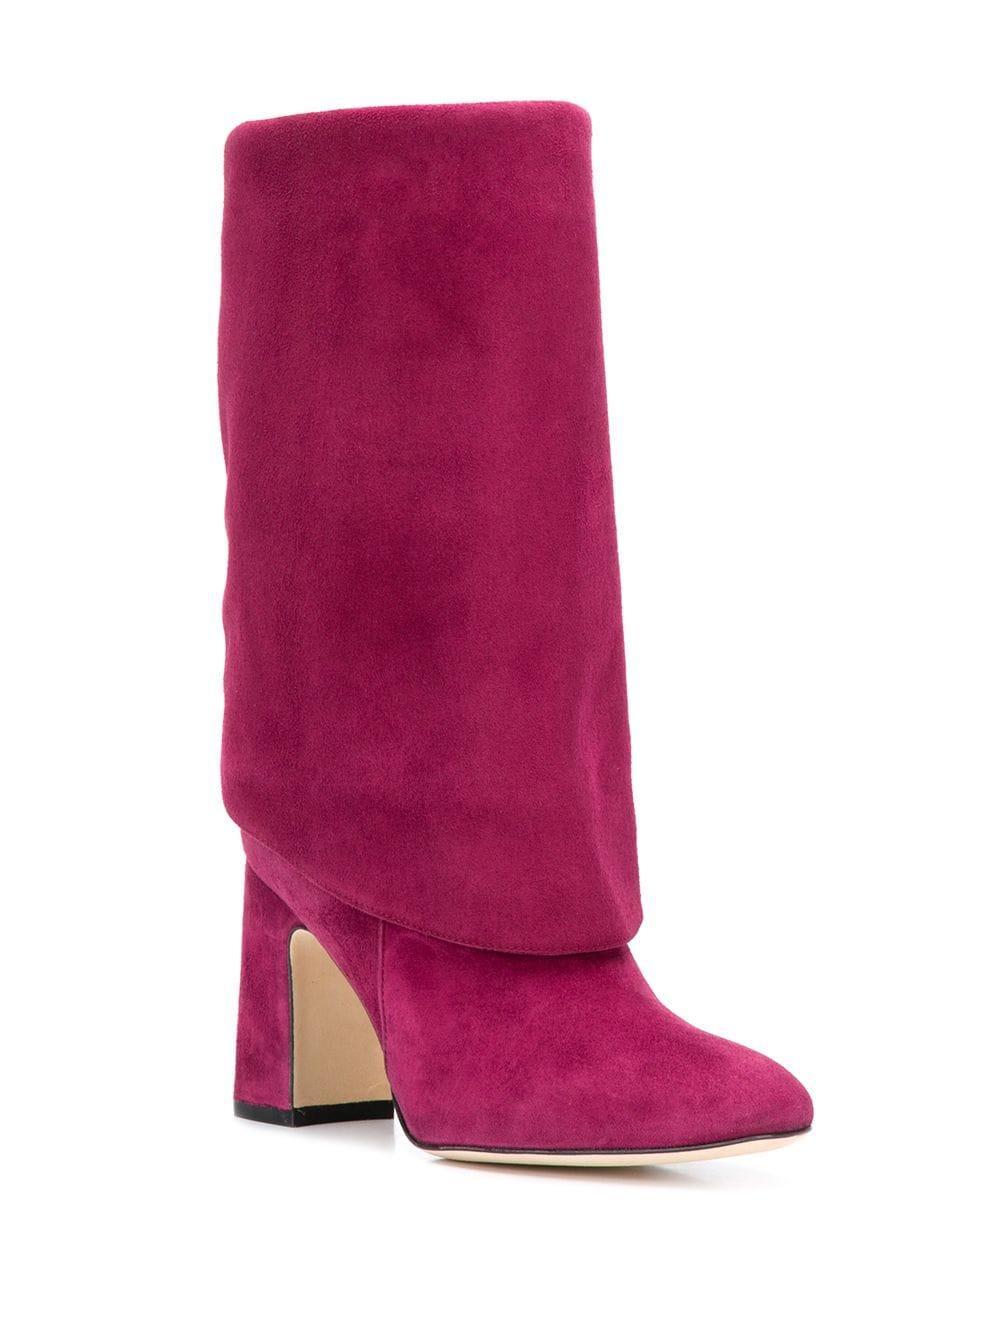 Botines Lucinda Stuart Weitzman de Cuero de color Rosa